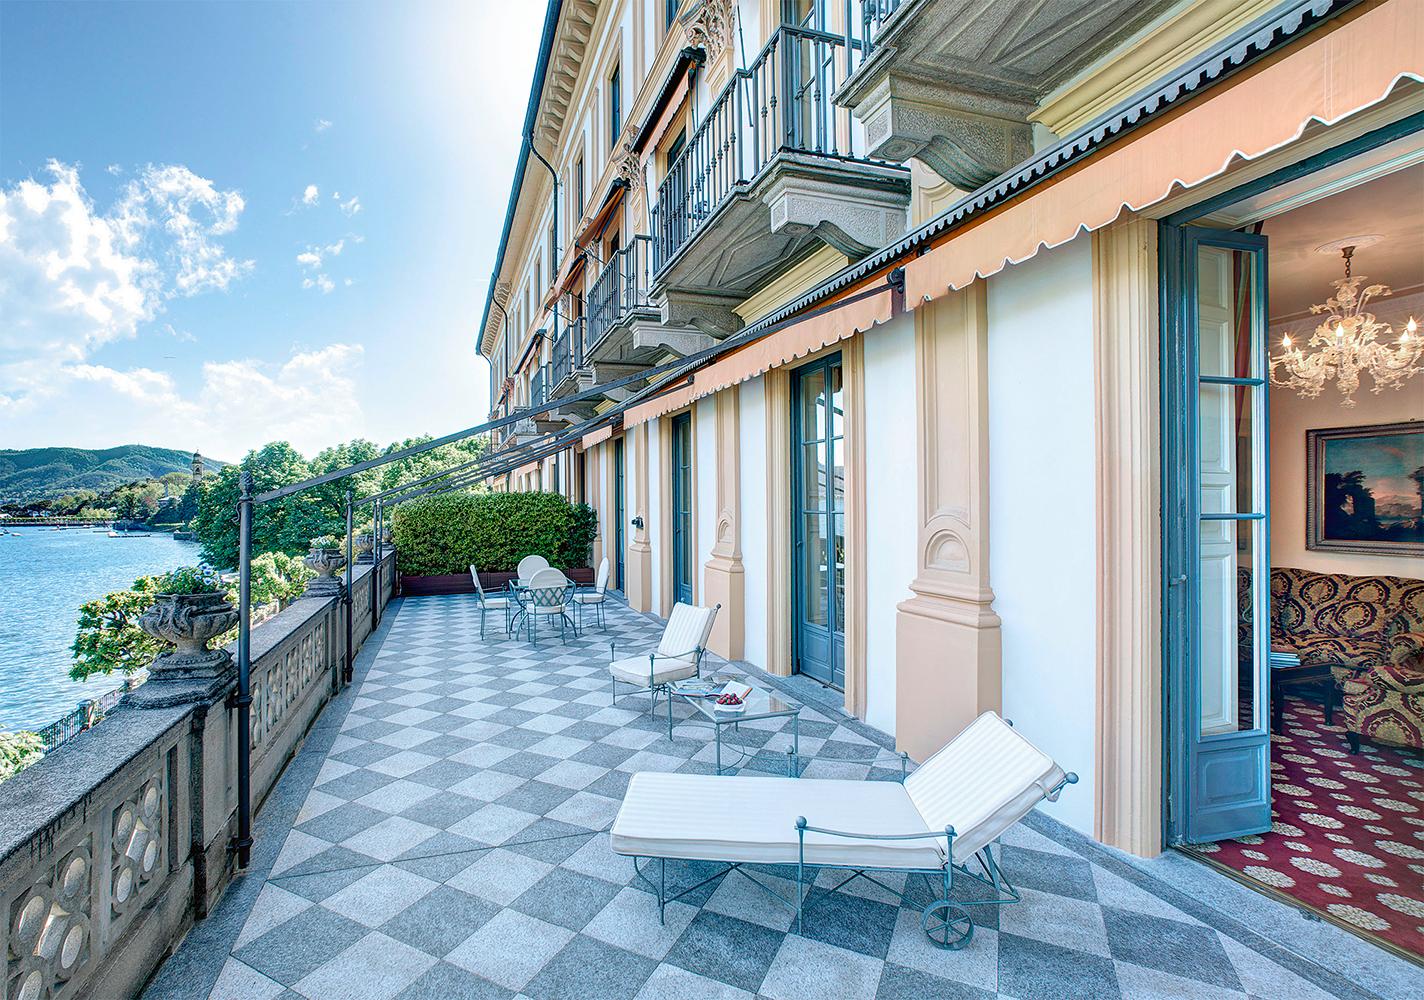 Romantic lakeside Hotels Italy Villa D'Este.jpg